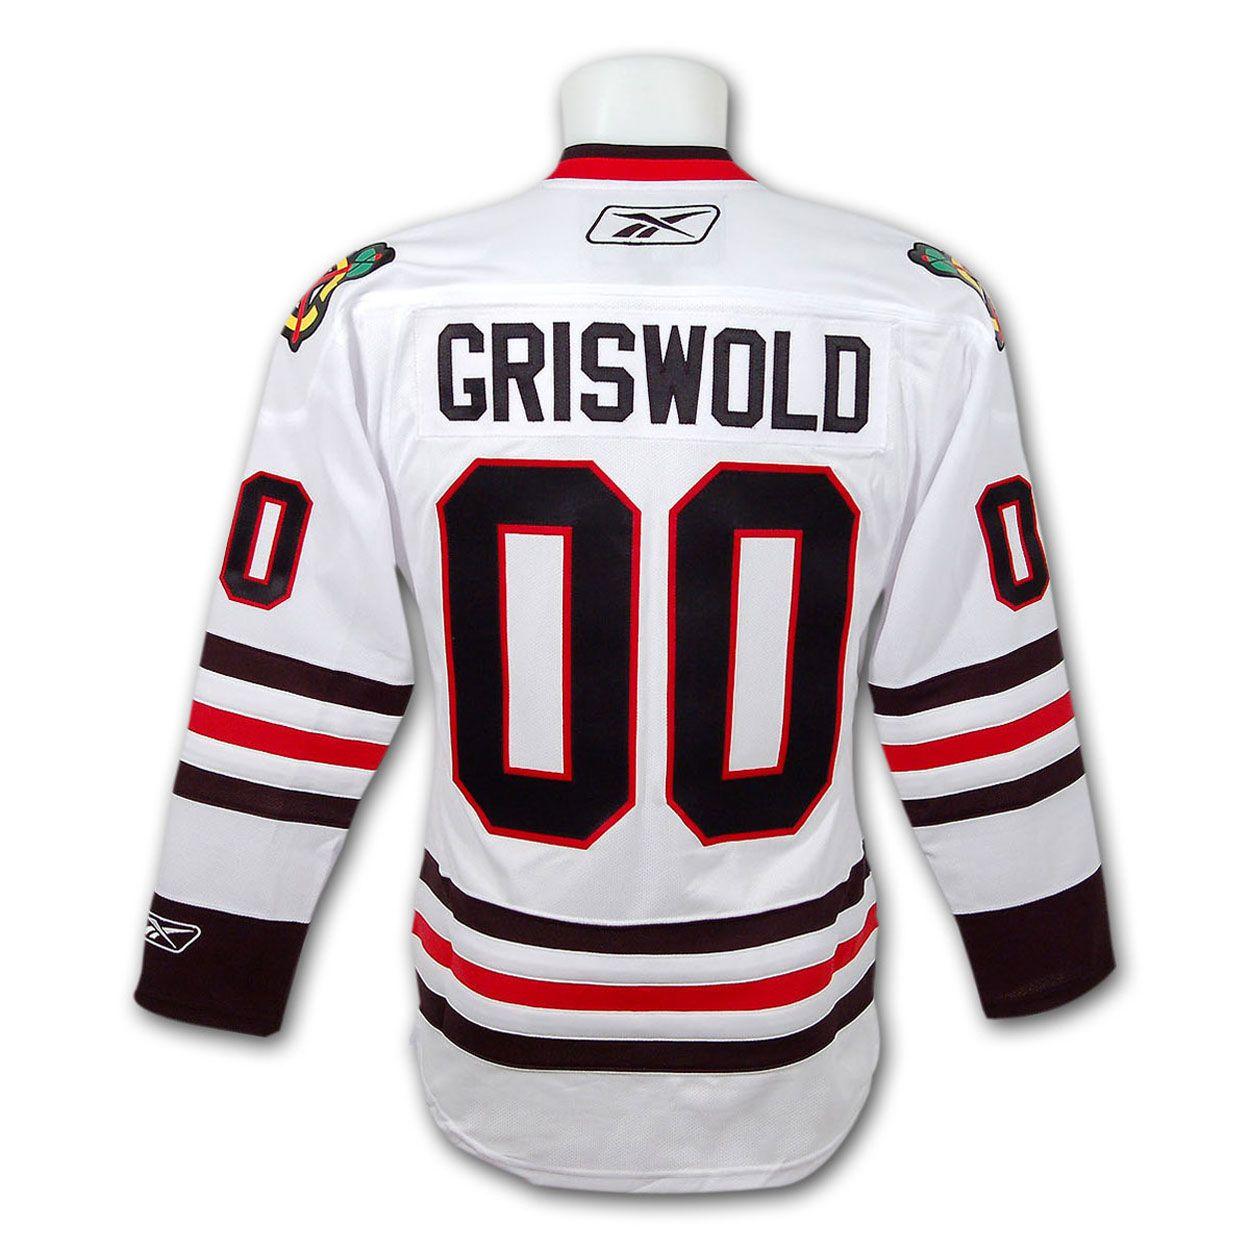 premium selection f64f8 6a2d4 Blackhawks Christmas Vacation jersey. | Hawks | Pinterest ...